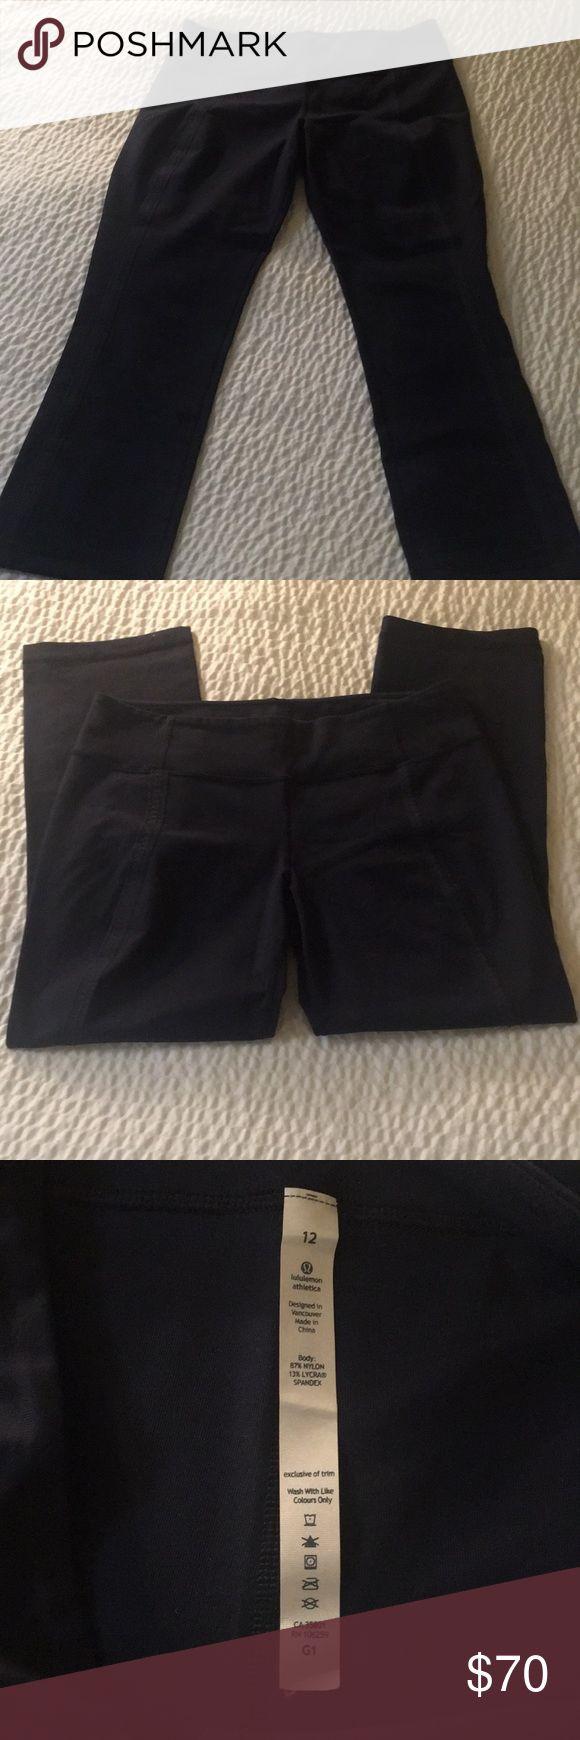 🎀Lululemon Athletica Navy Crop Pants Size 12 Description: -Brand: Lululemon -Color: Navy -Size:12  Designed in Vancouver.  Made in China. lululemon athletica Pants Ankle & Cropped